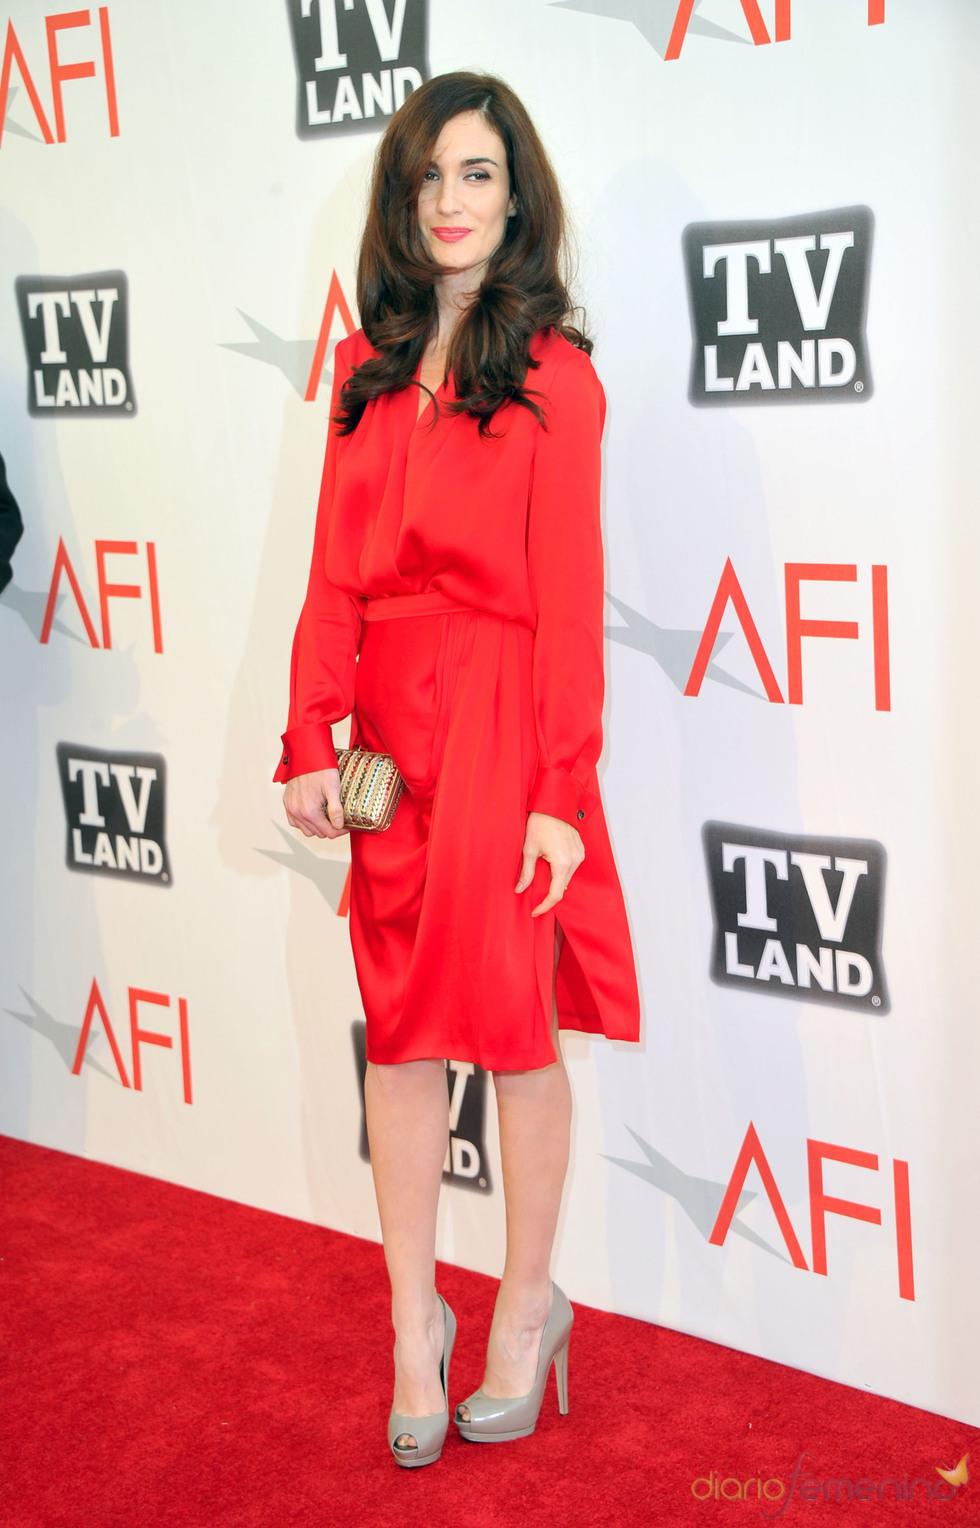 Paz Vega en los Premios AFI 2011